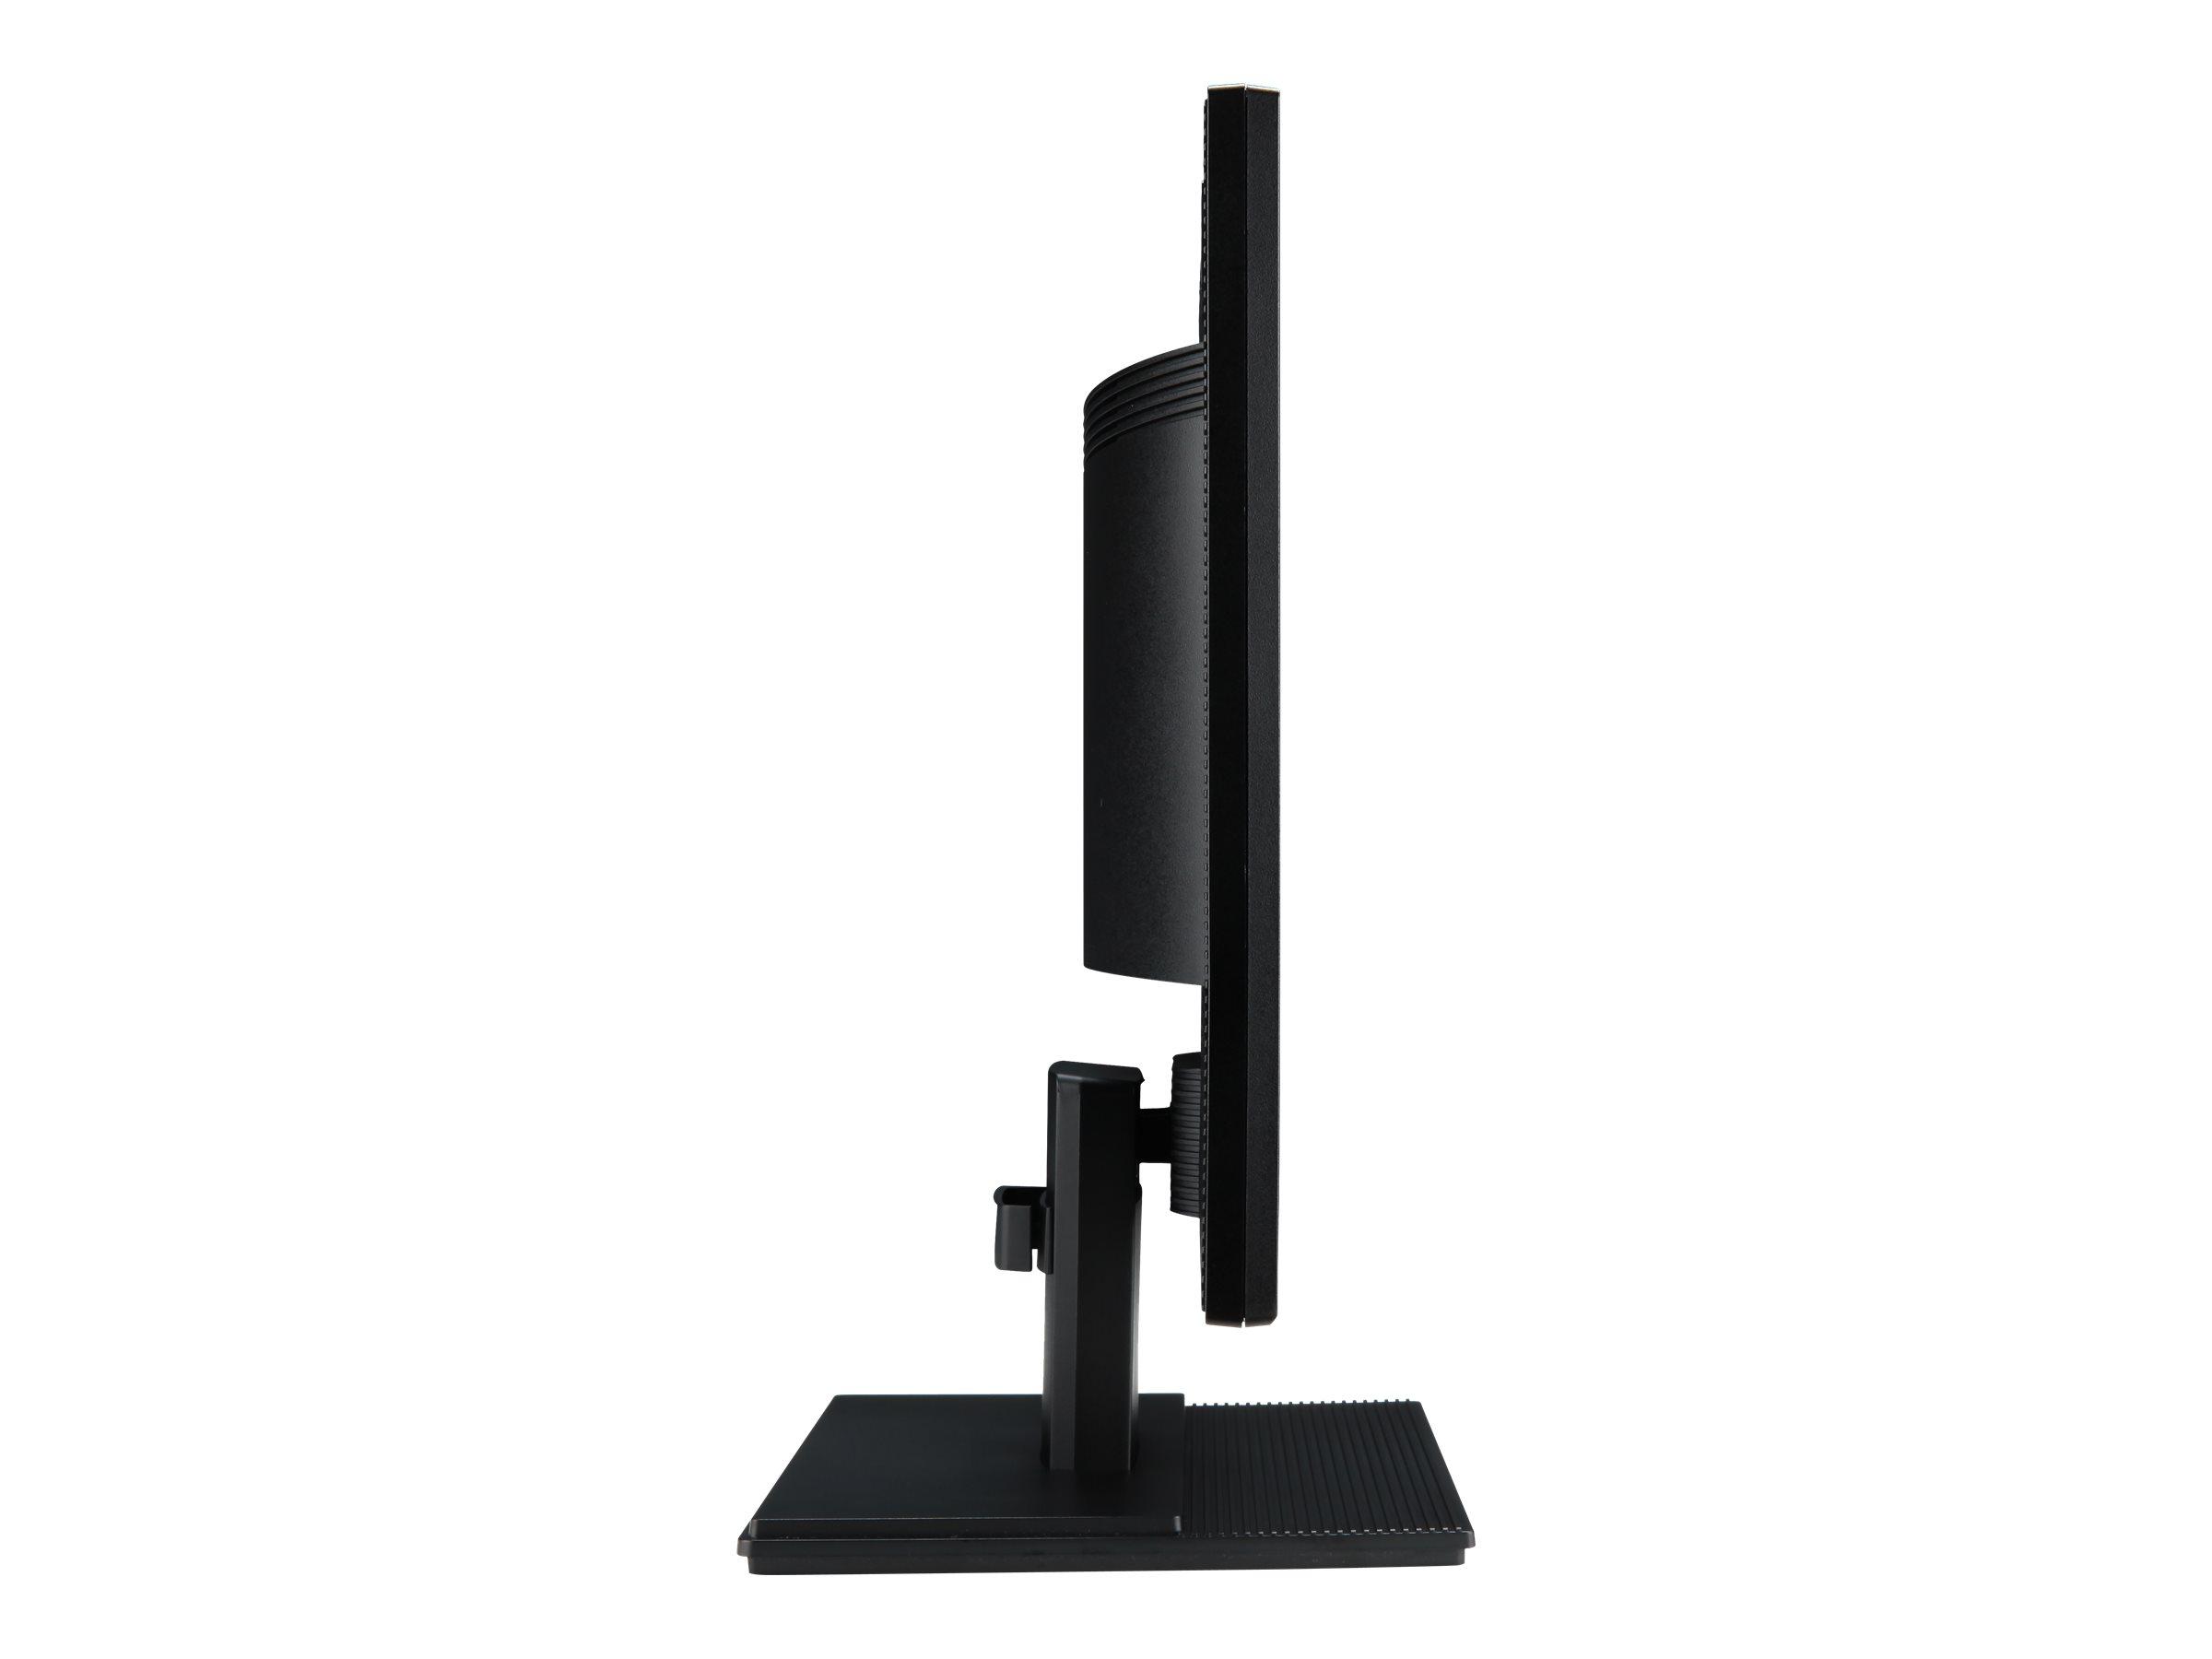 "V206HQL - 19.5"" LED/5ms/Black (UM.IV6EE.B01) - Achat / Vente Ecran PC sur Picata.fr - 2"